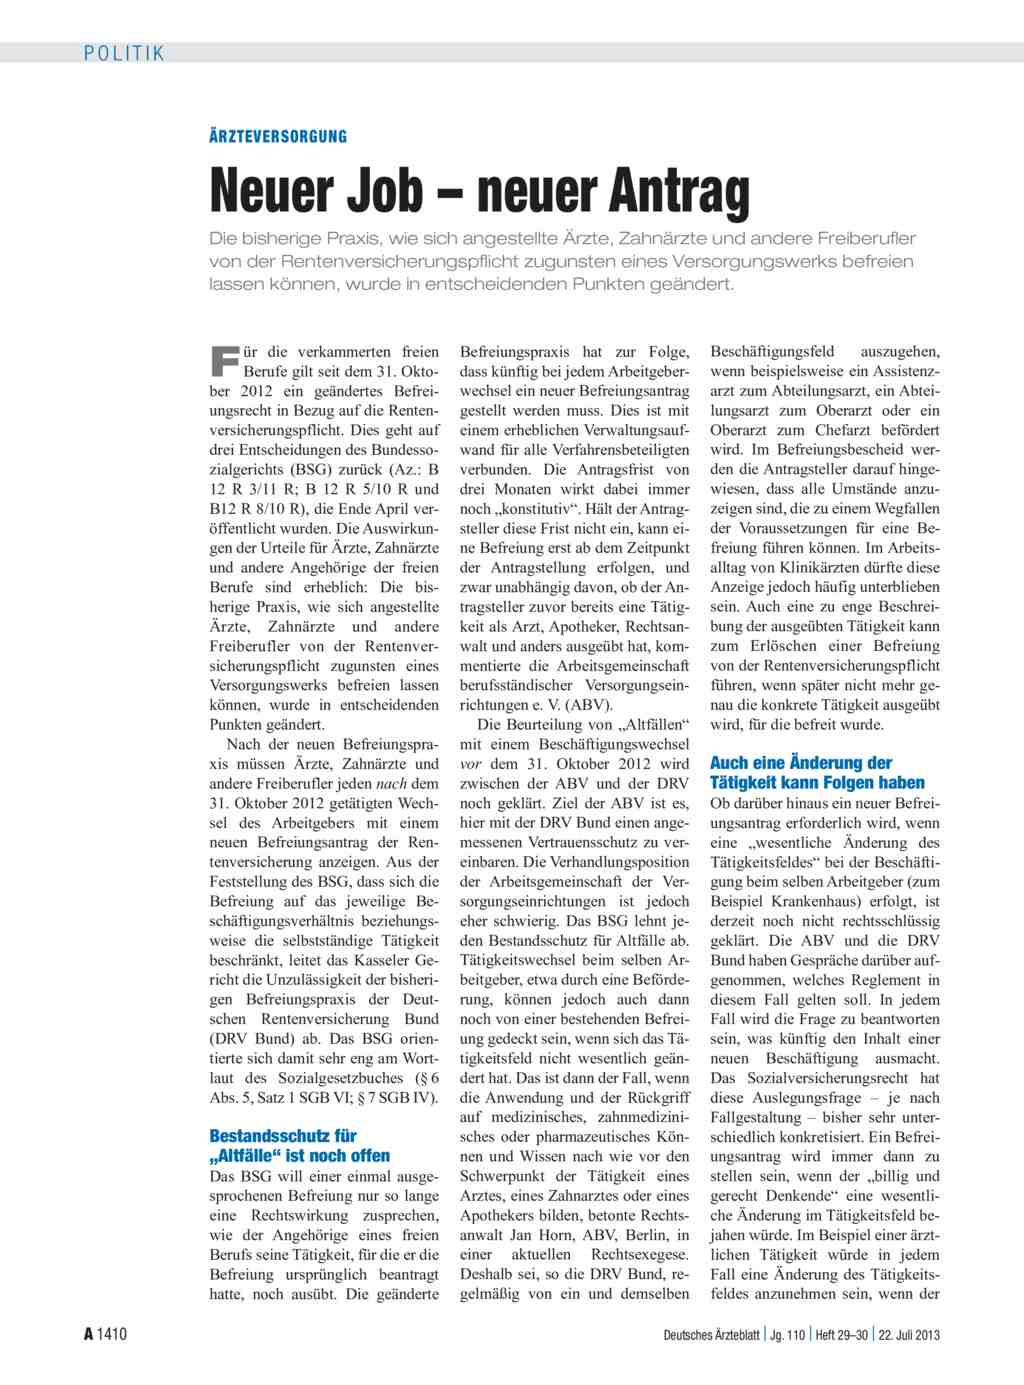 ärzteversorgung Neuer Job Neuer Antrag